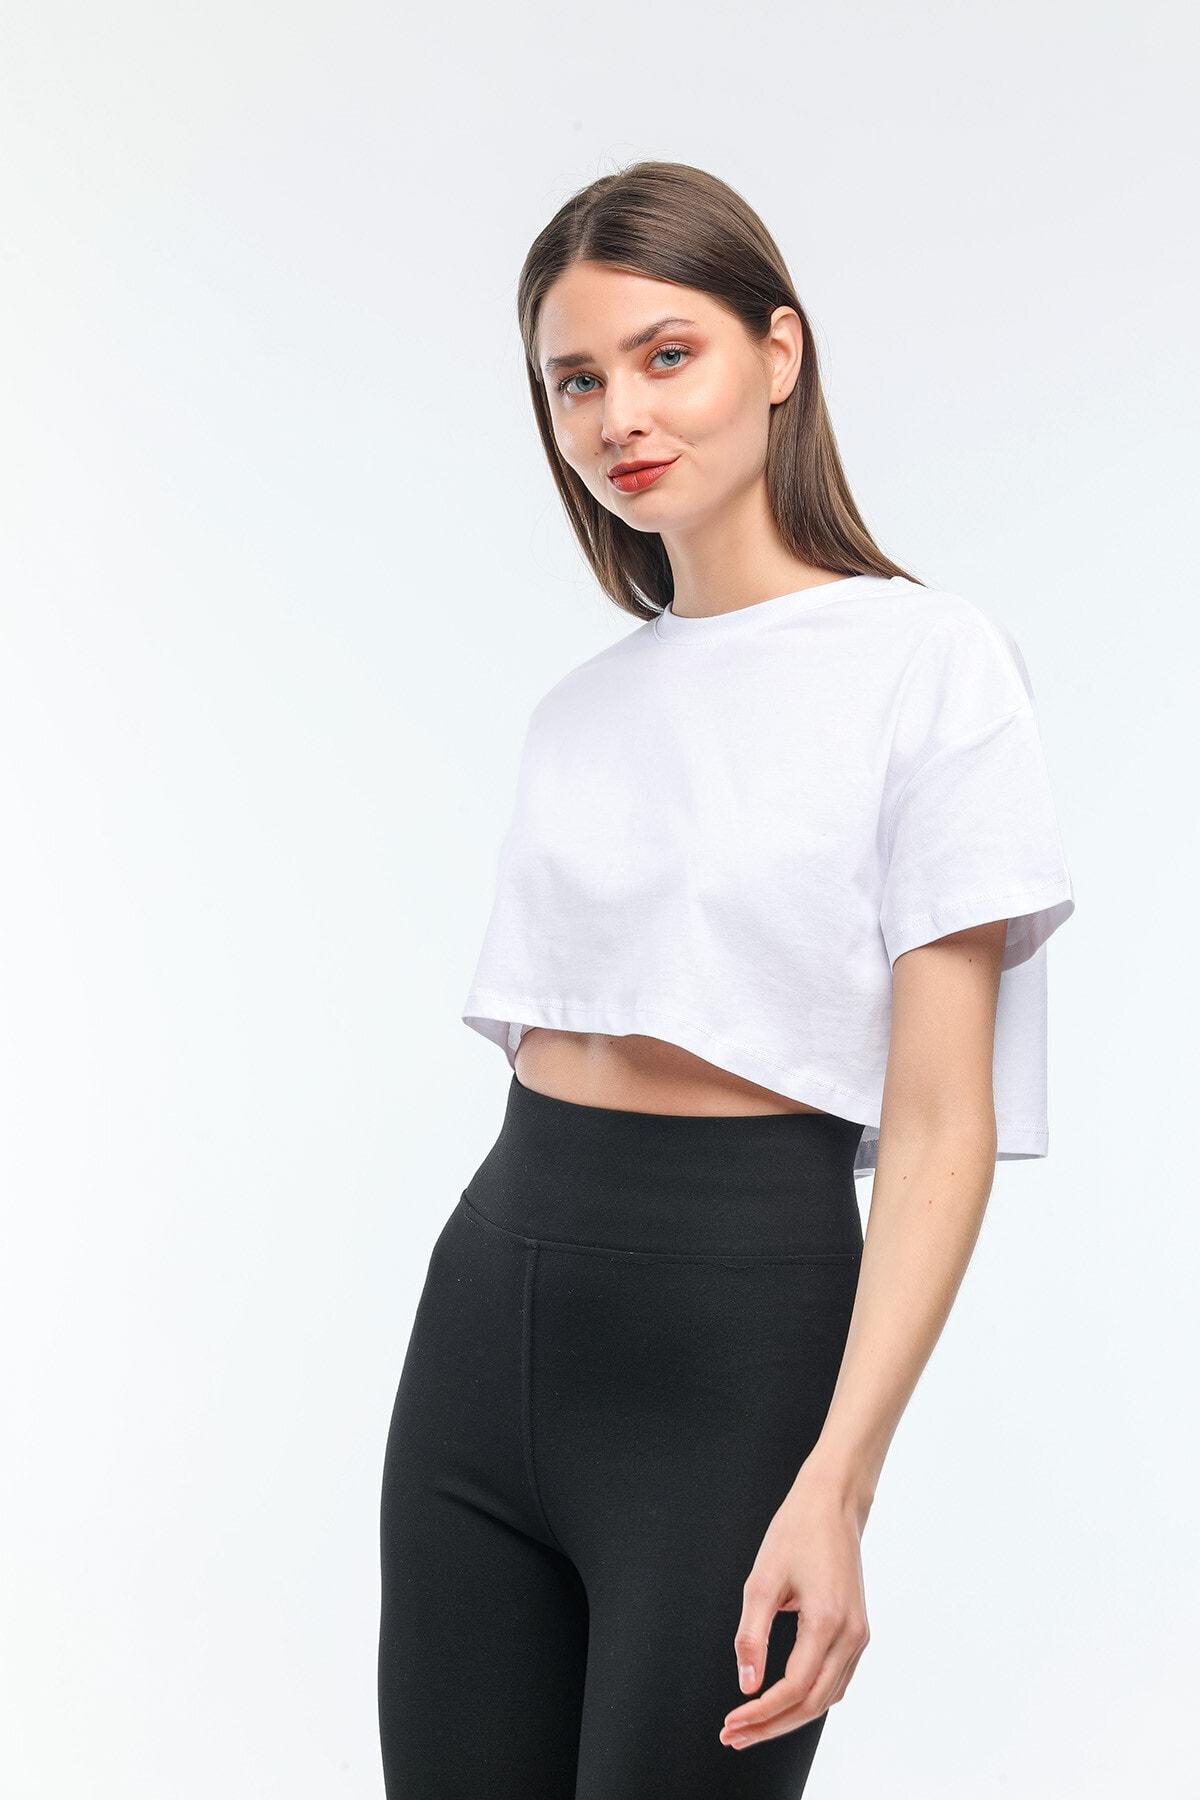 Nairobi Kadın Basic Bisiklet Yaka Crop Top Tişört Kadın Beyaz Crop Tişört Beyaz Kadın Tişört